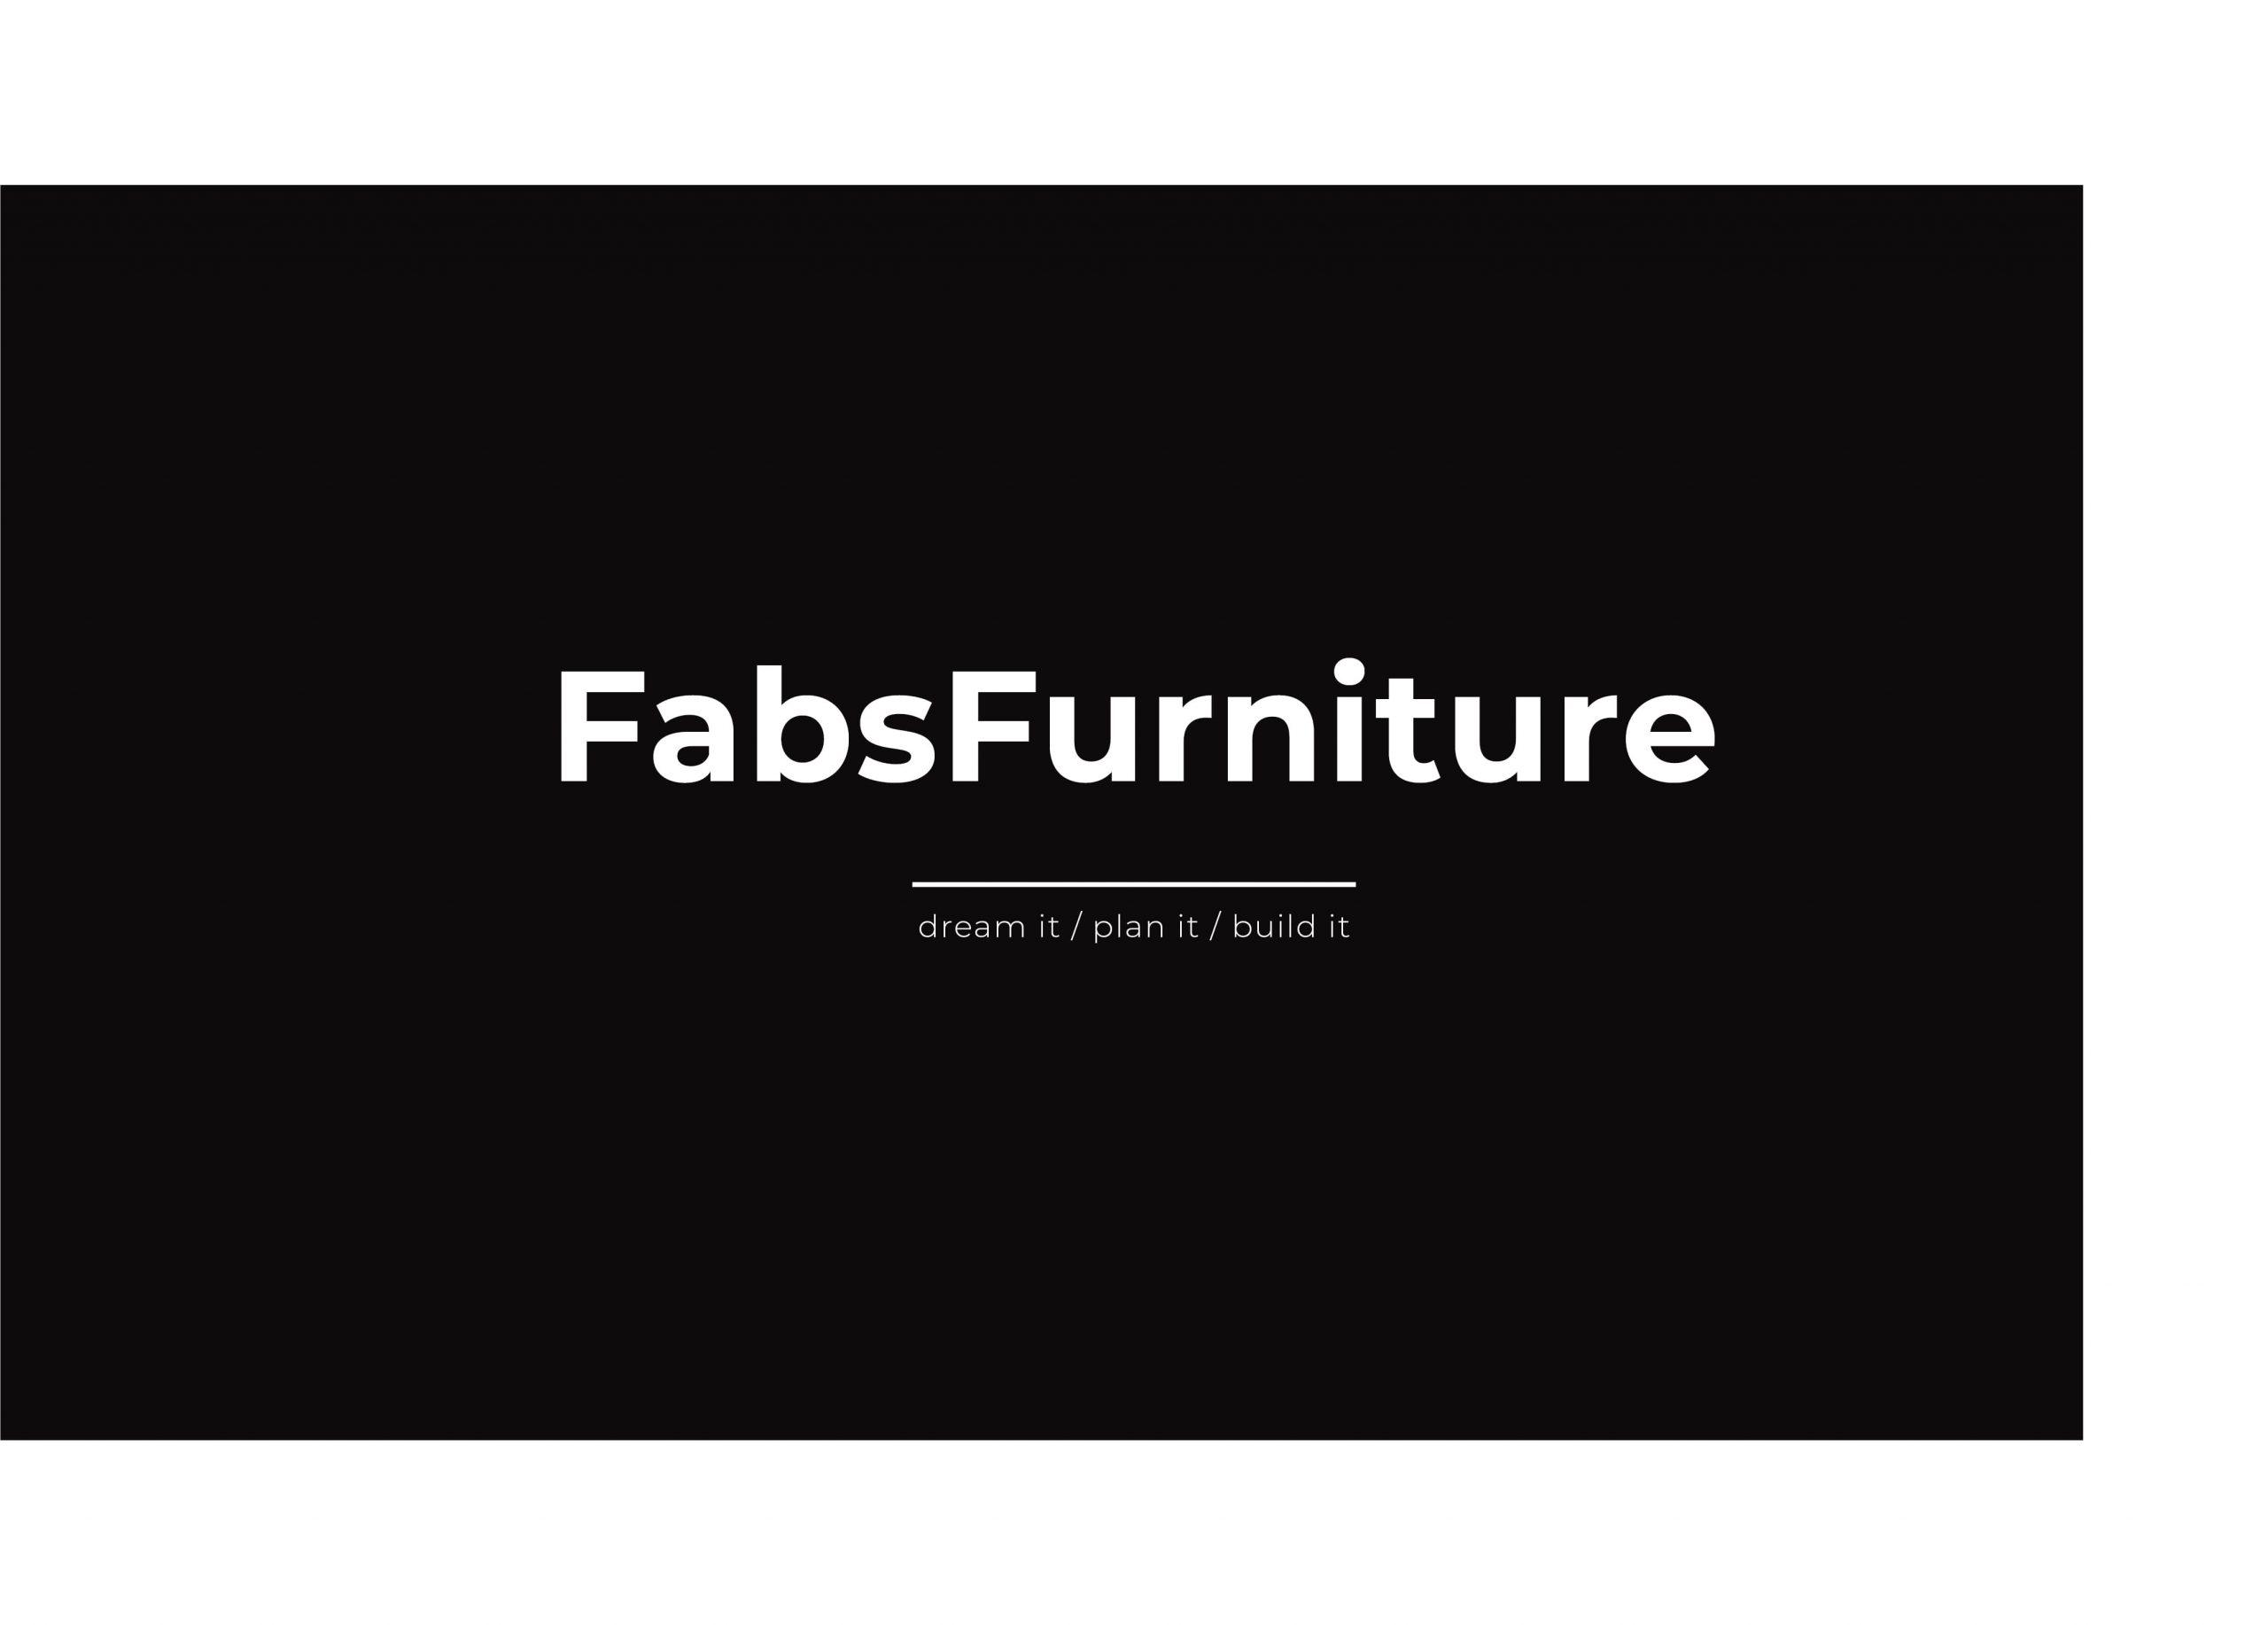 FabsFurniture - Design - Taiwan Portfolio - 2021 - wood design